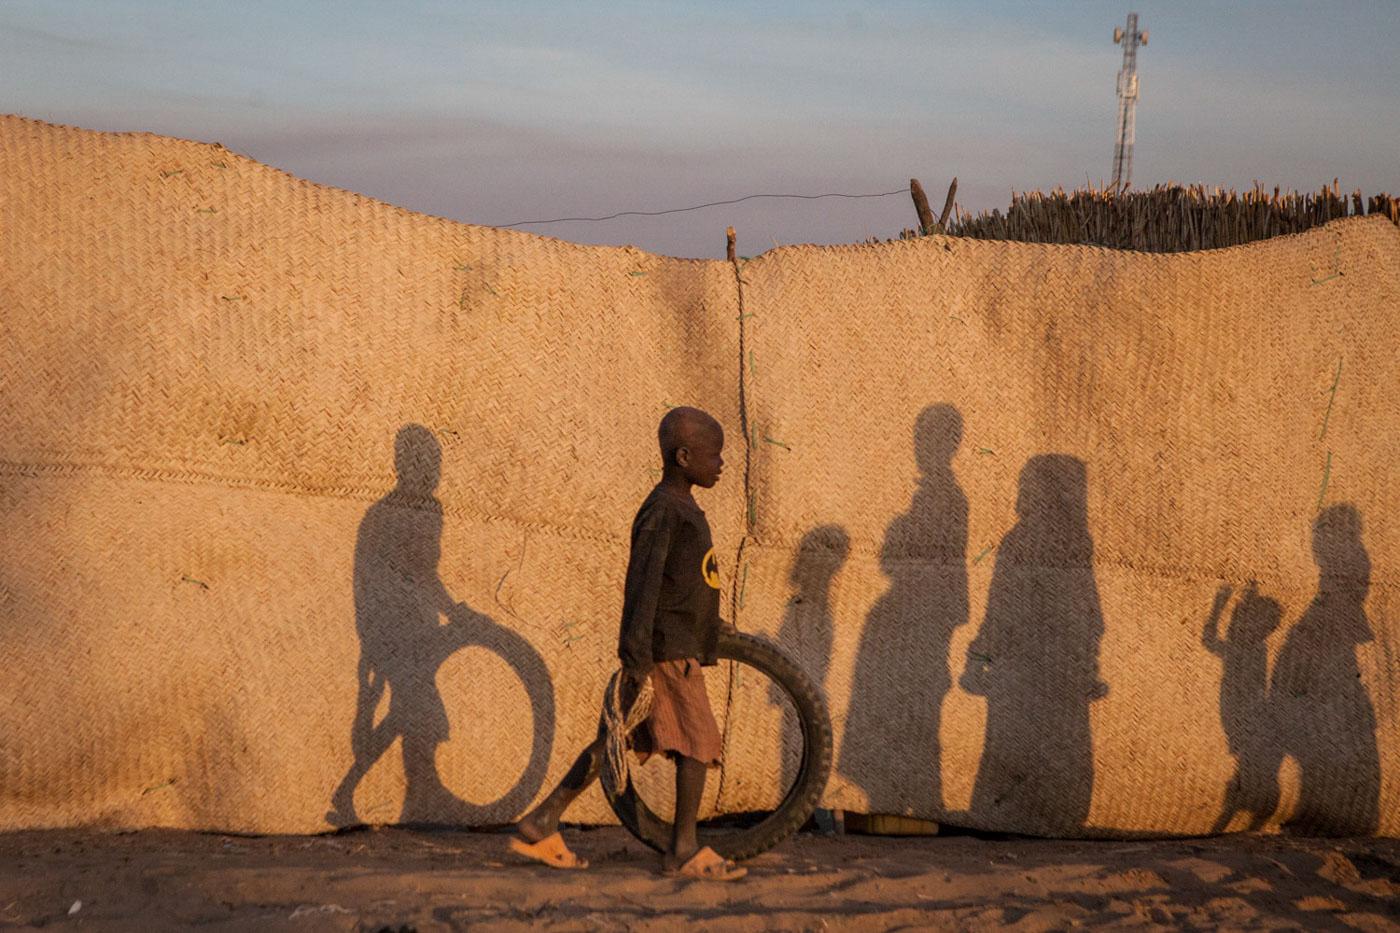 Children play in Kindjandi Town/Camp in Diffa, Niger